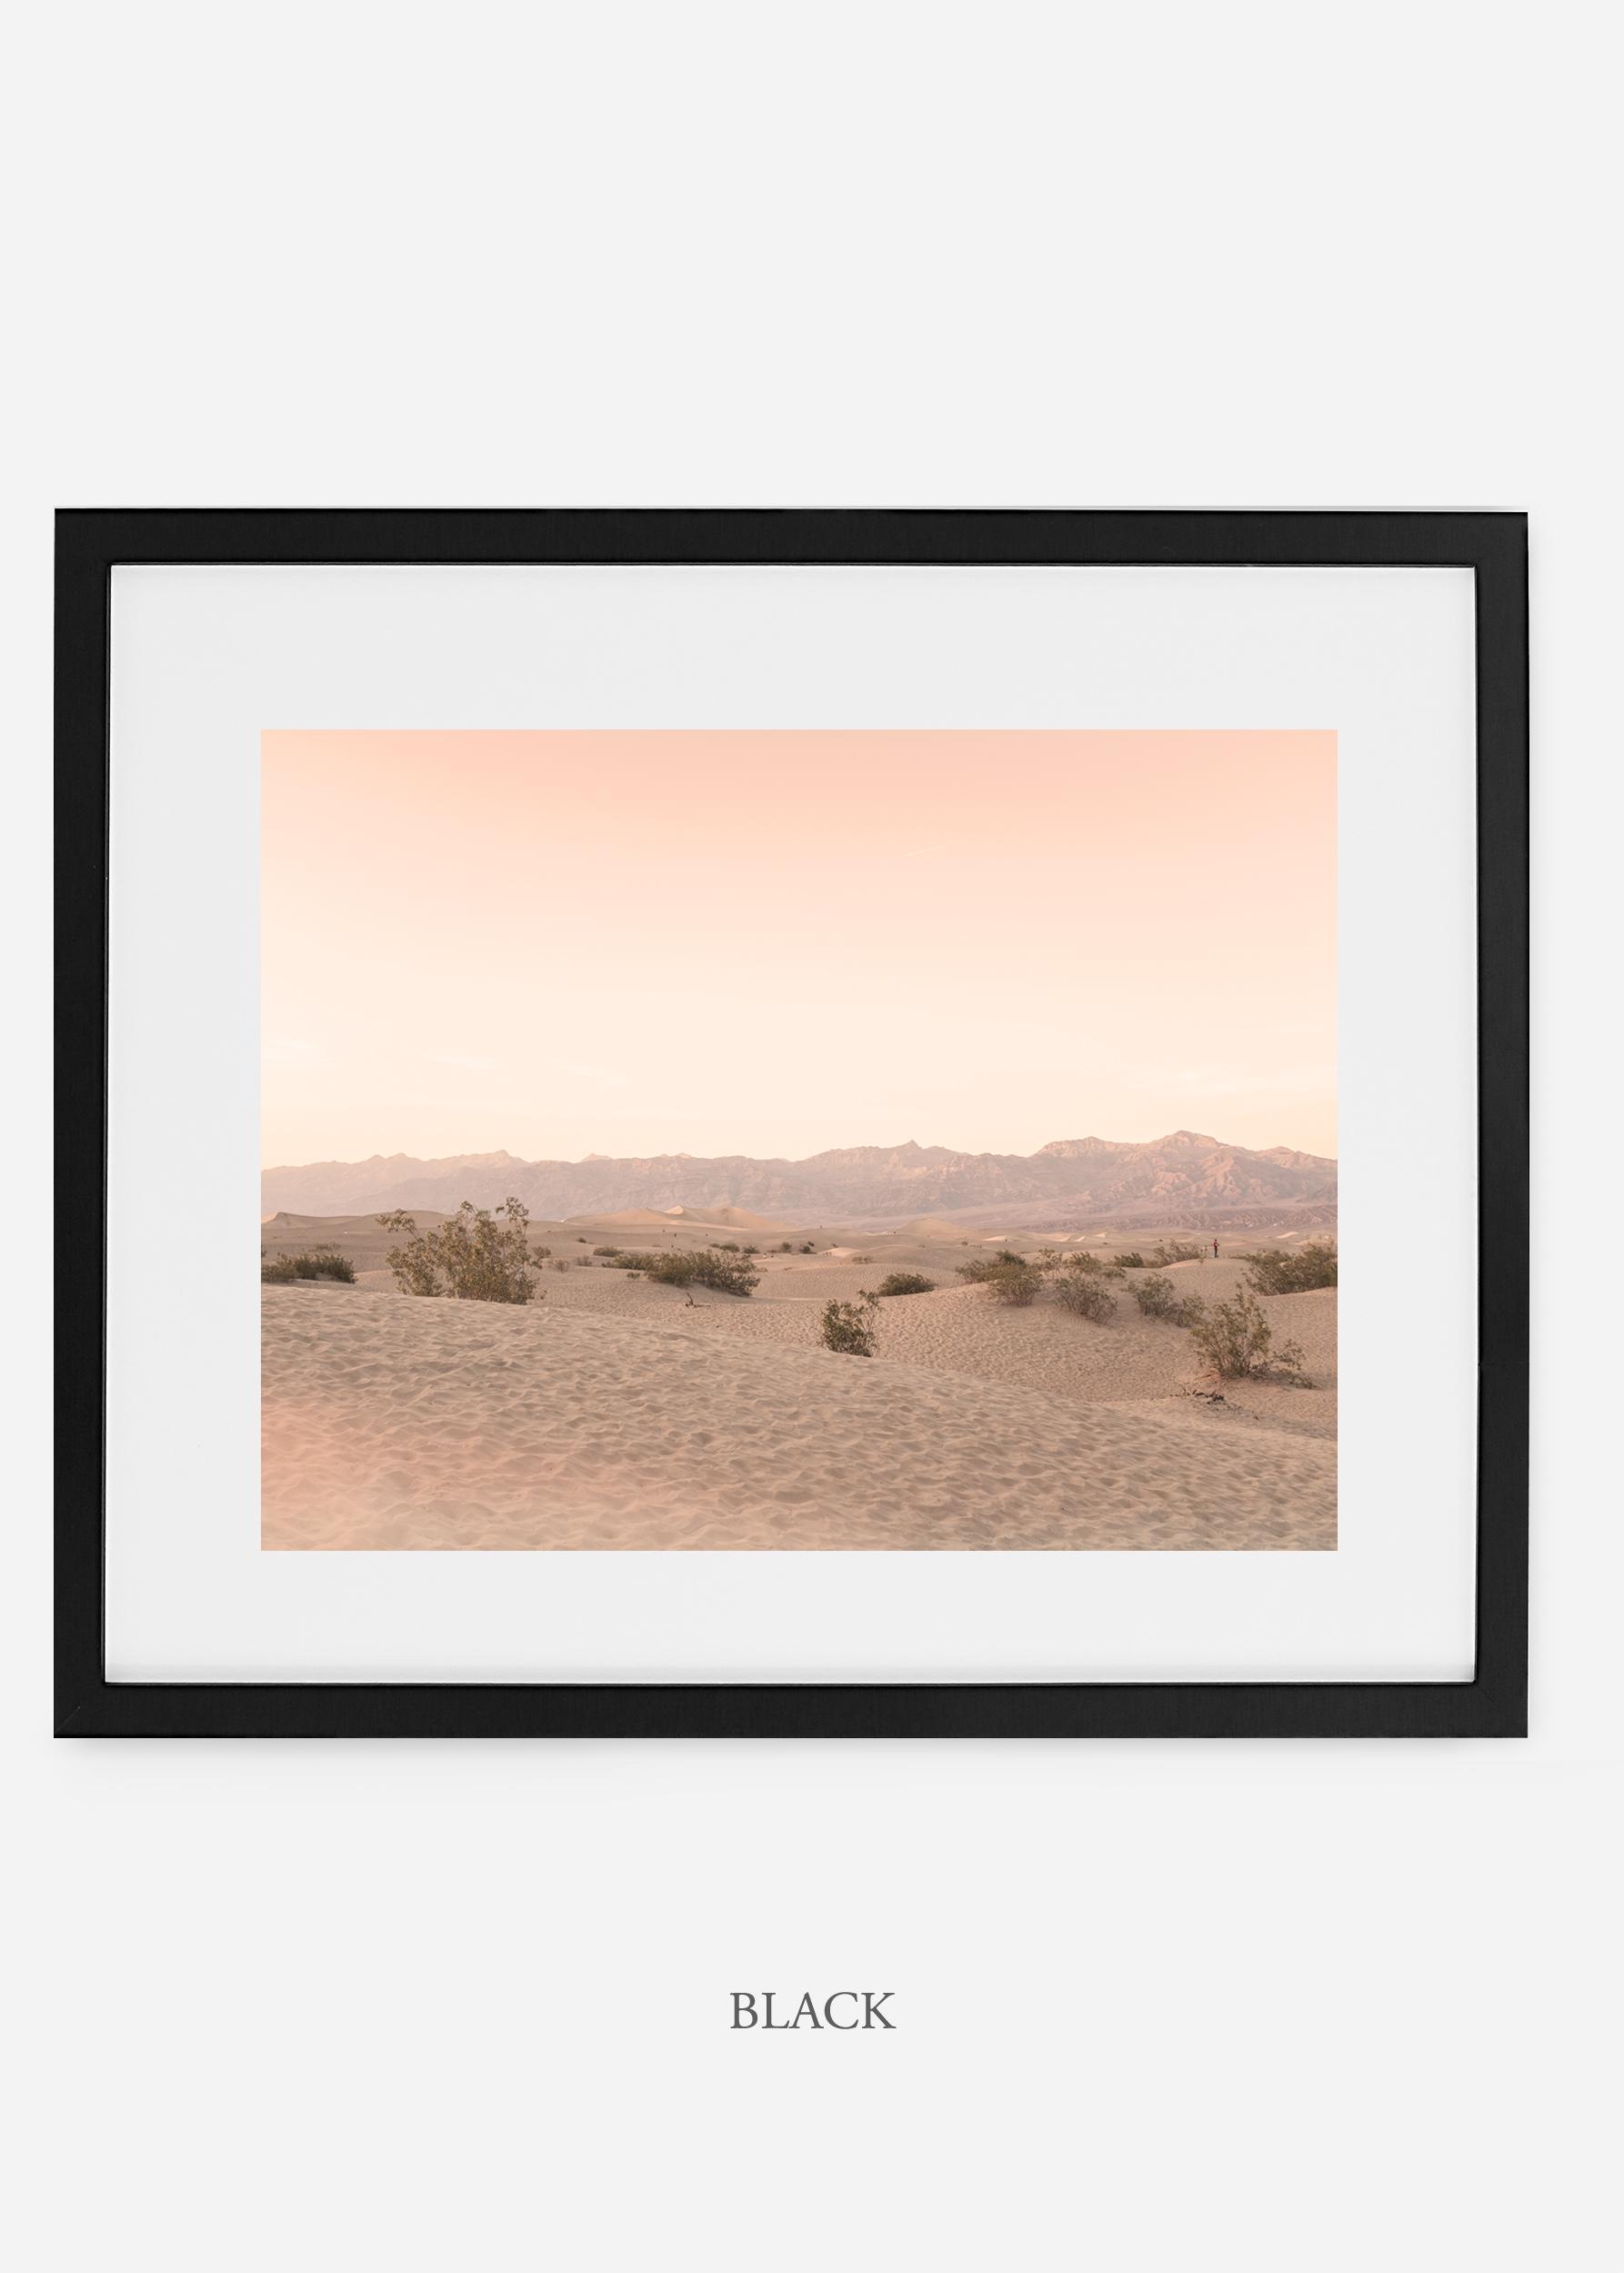 wildercalifornia_blackframe__deathvalley_4_cactus_art_interiordesign_blackandwhite.jpg